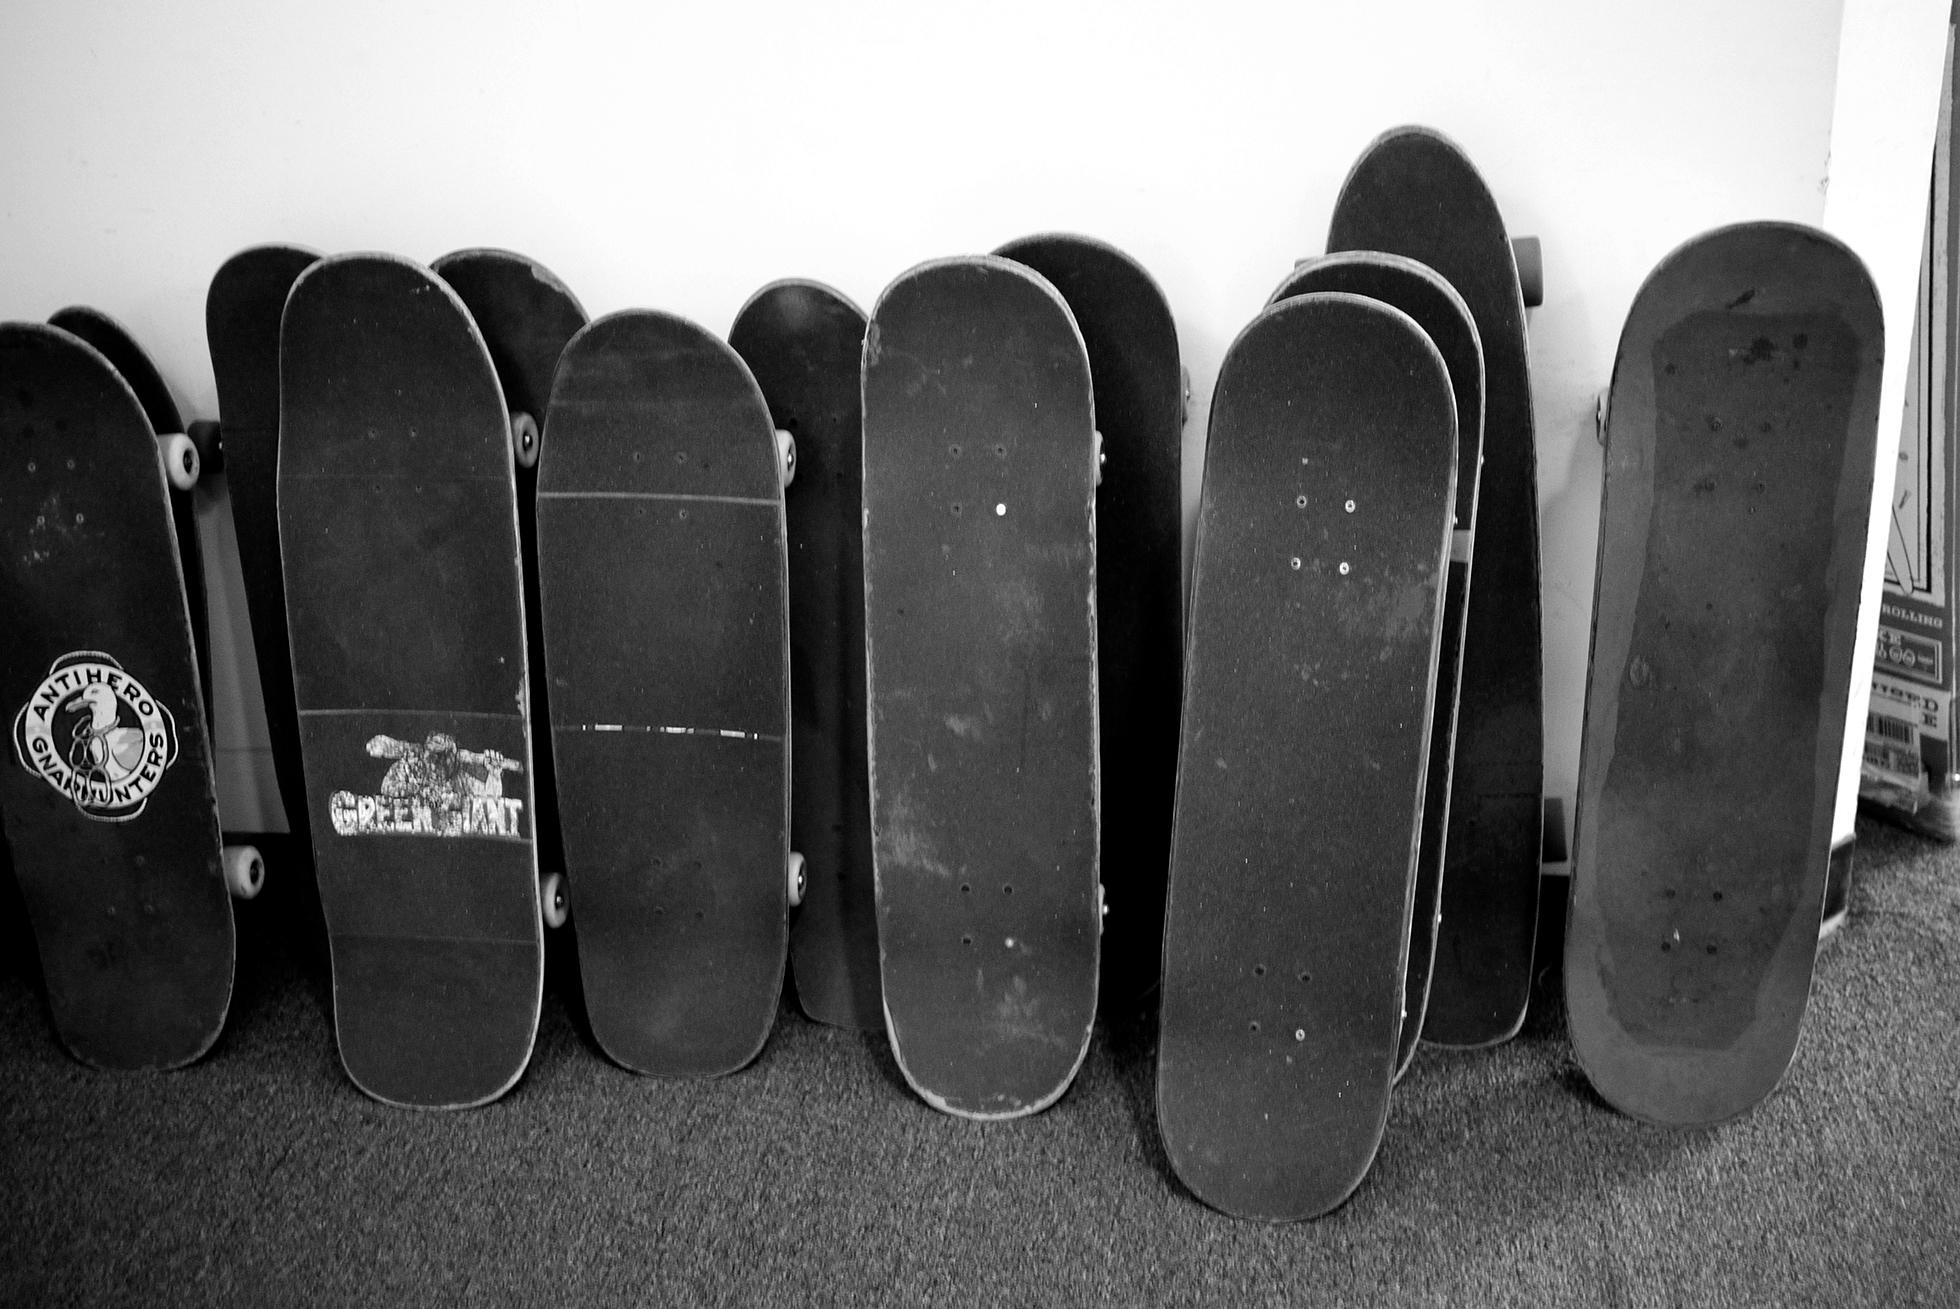 Skateboard Deck Buying Guide - 2021